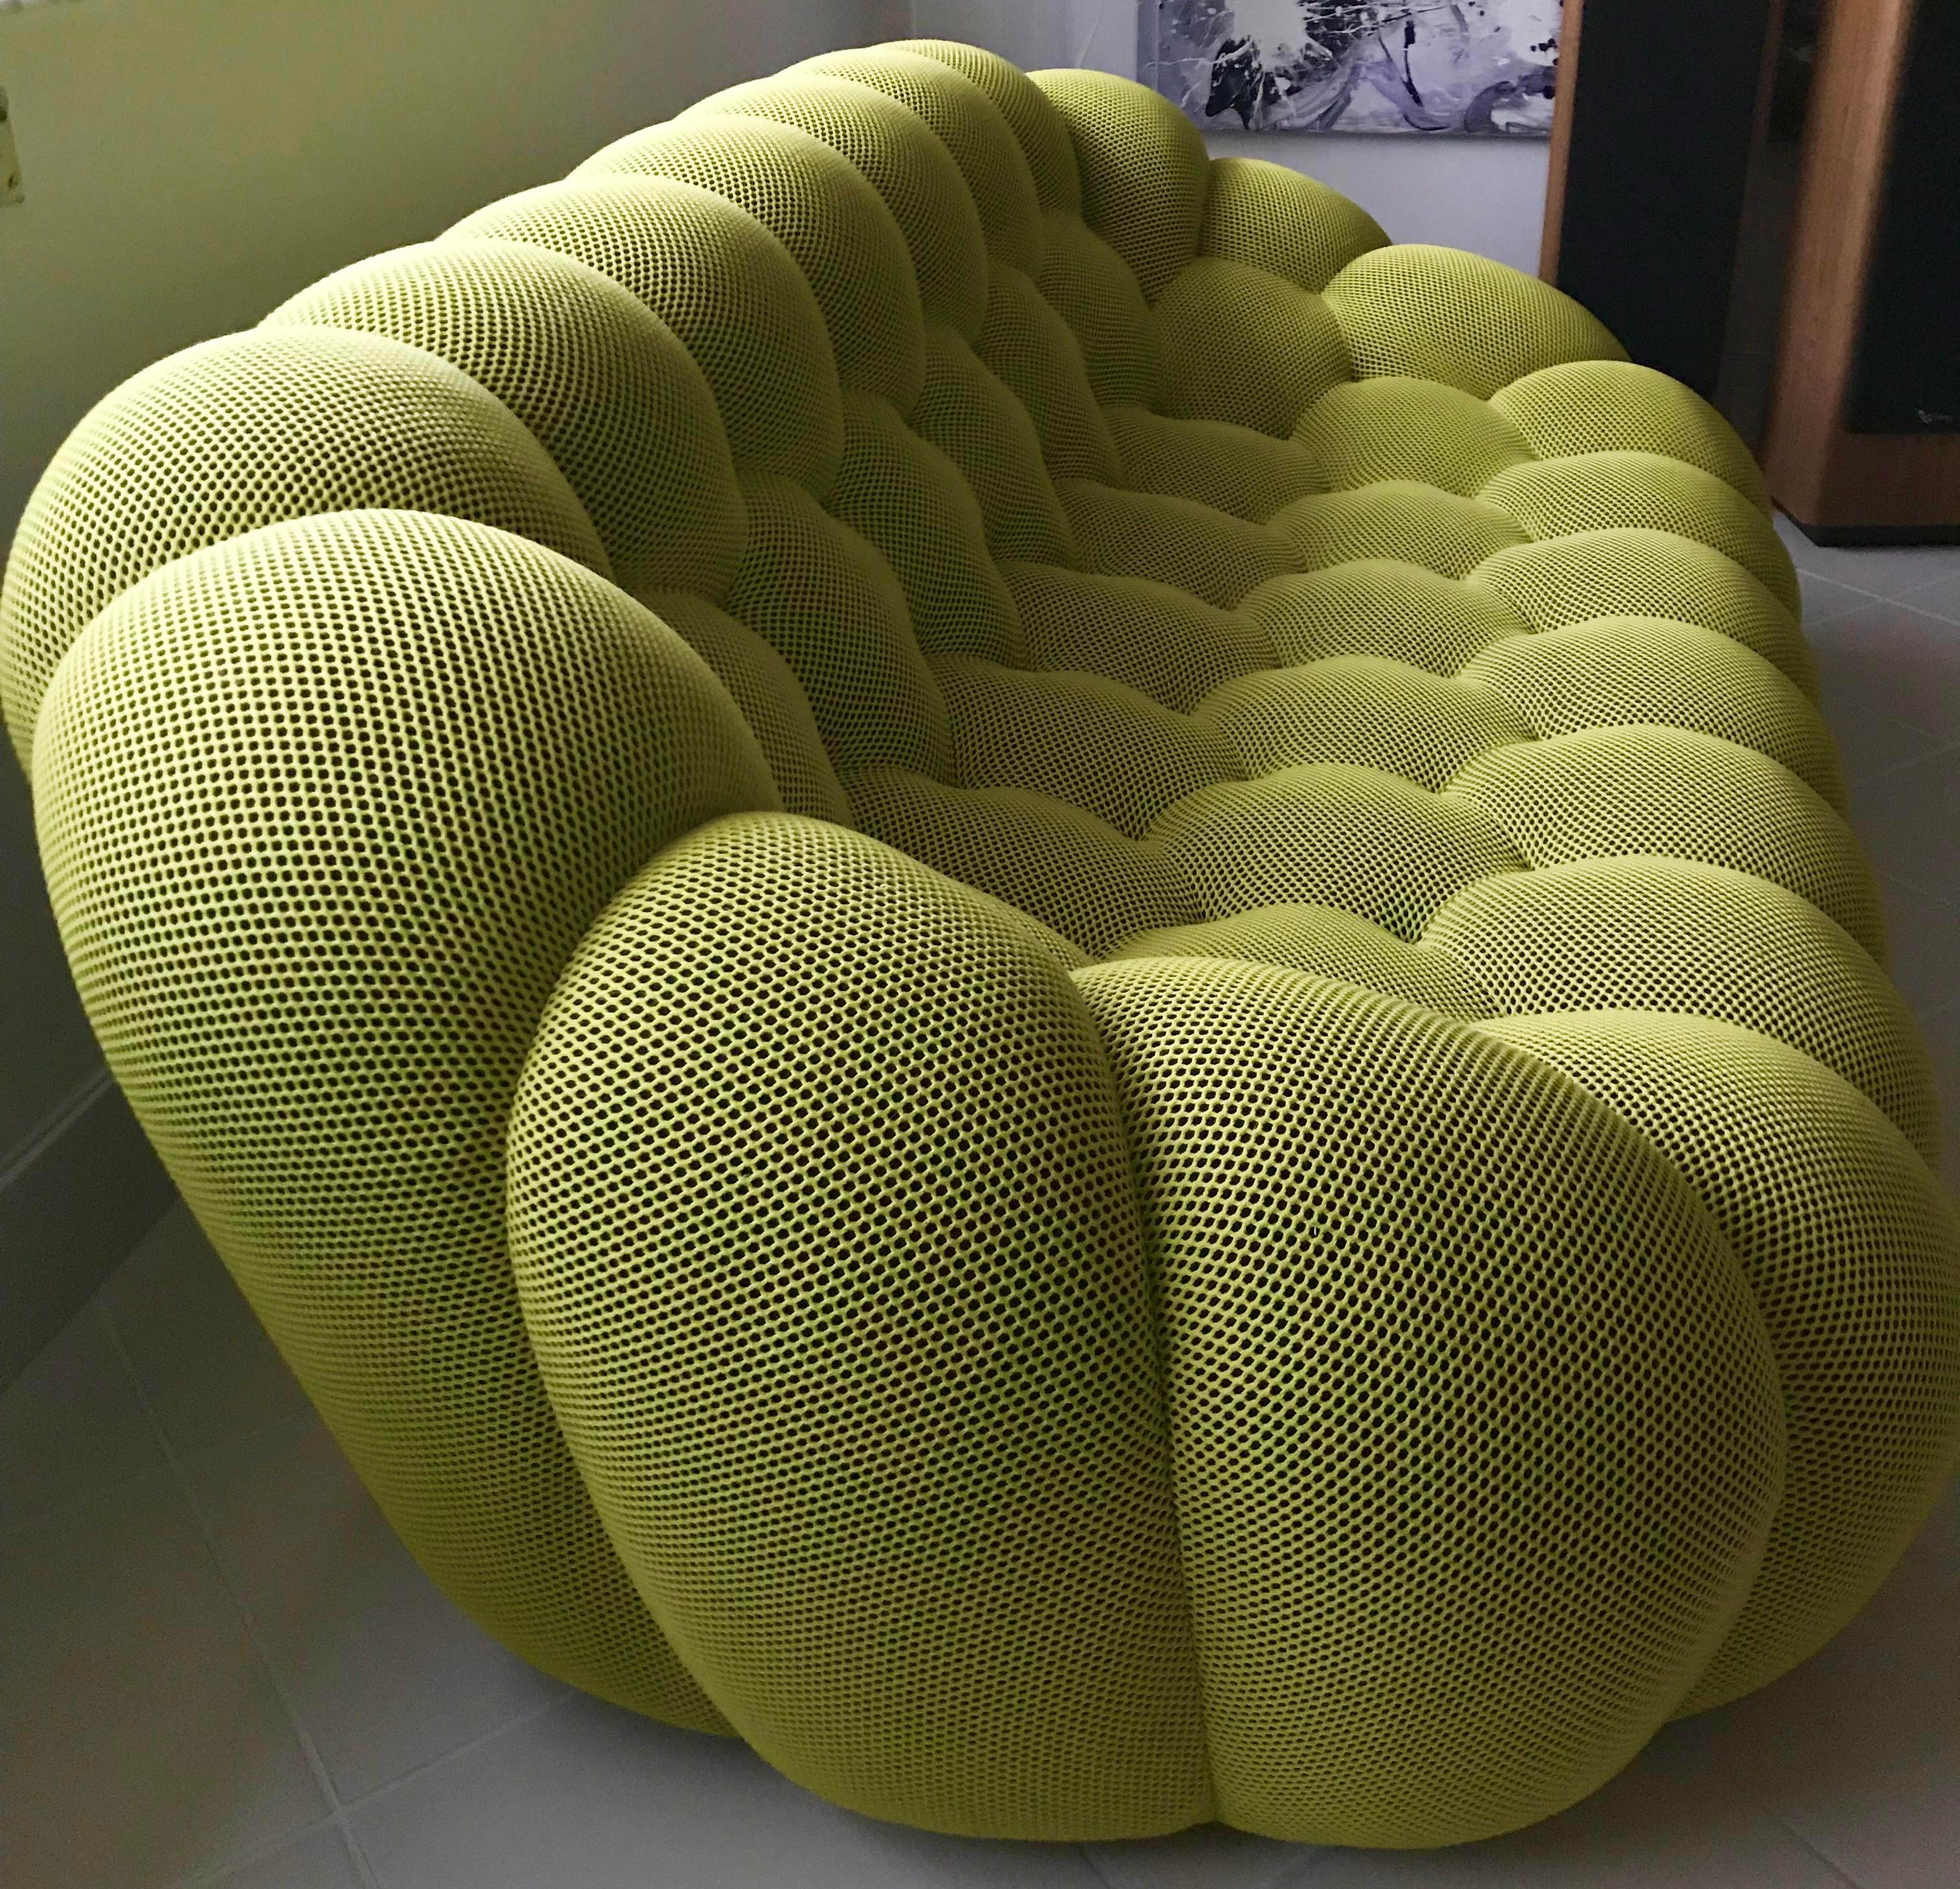 Bubble Sofa By Sacha Lakic For Roche Bobois   Image 3 Of 6